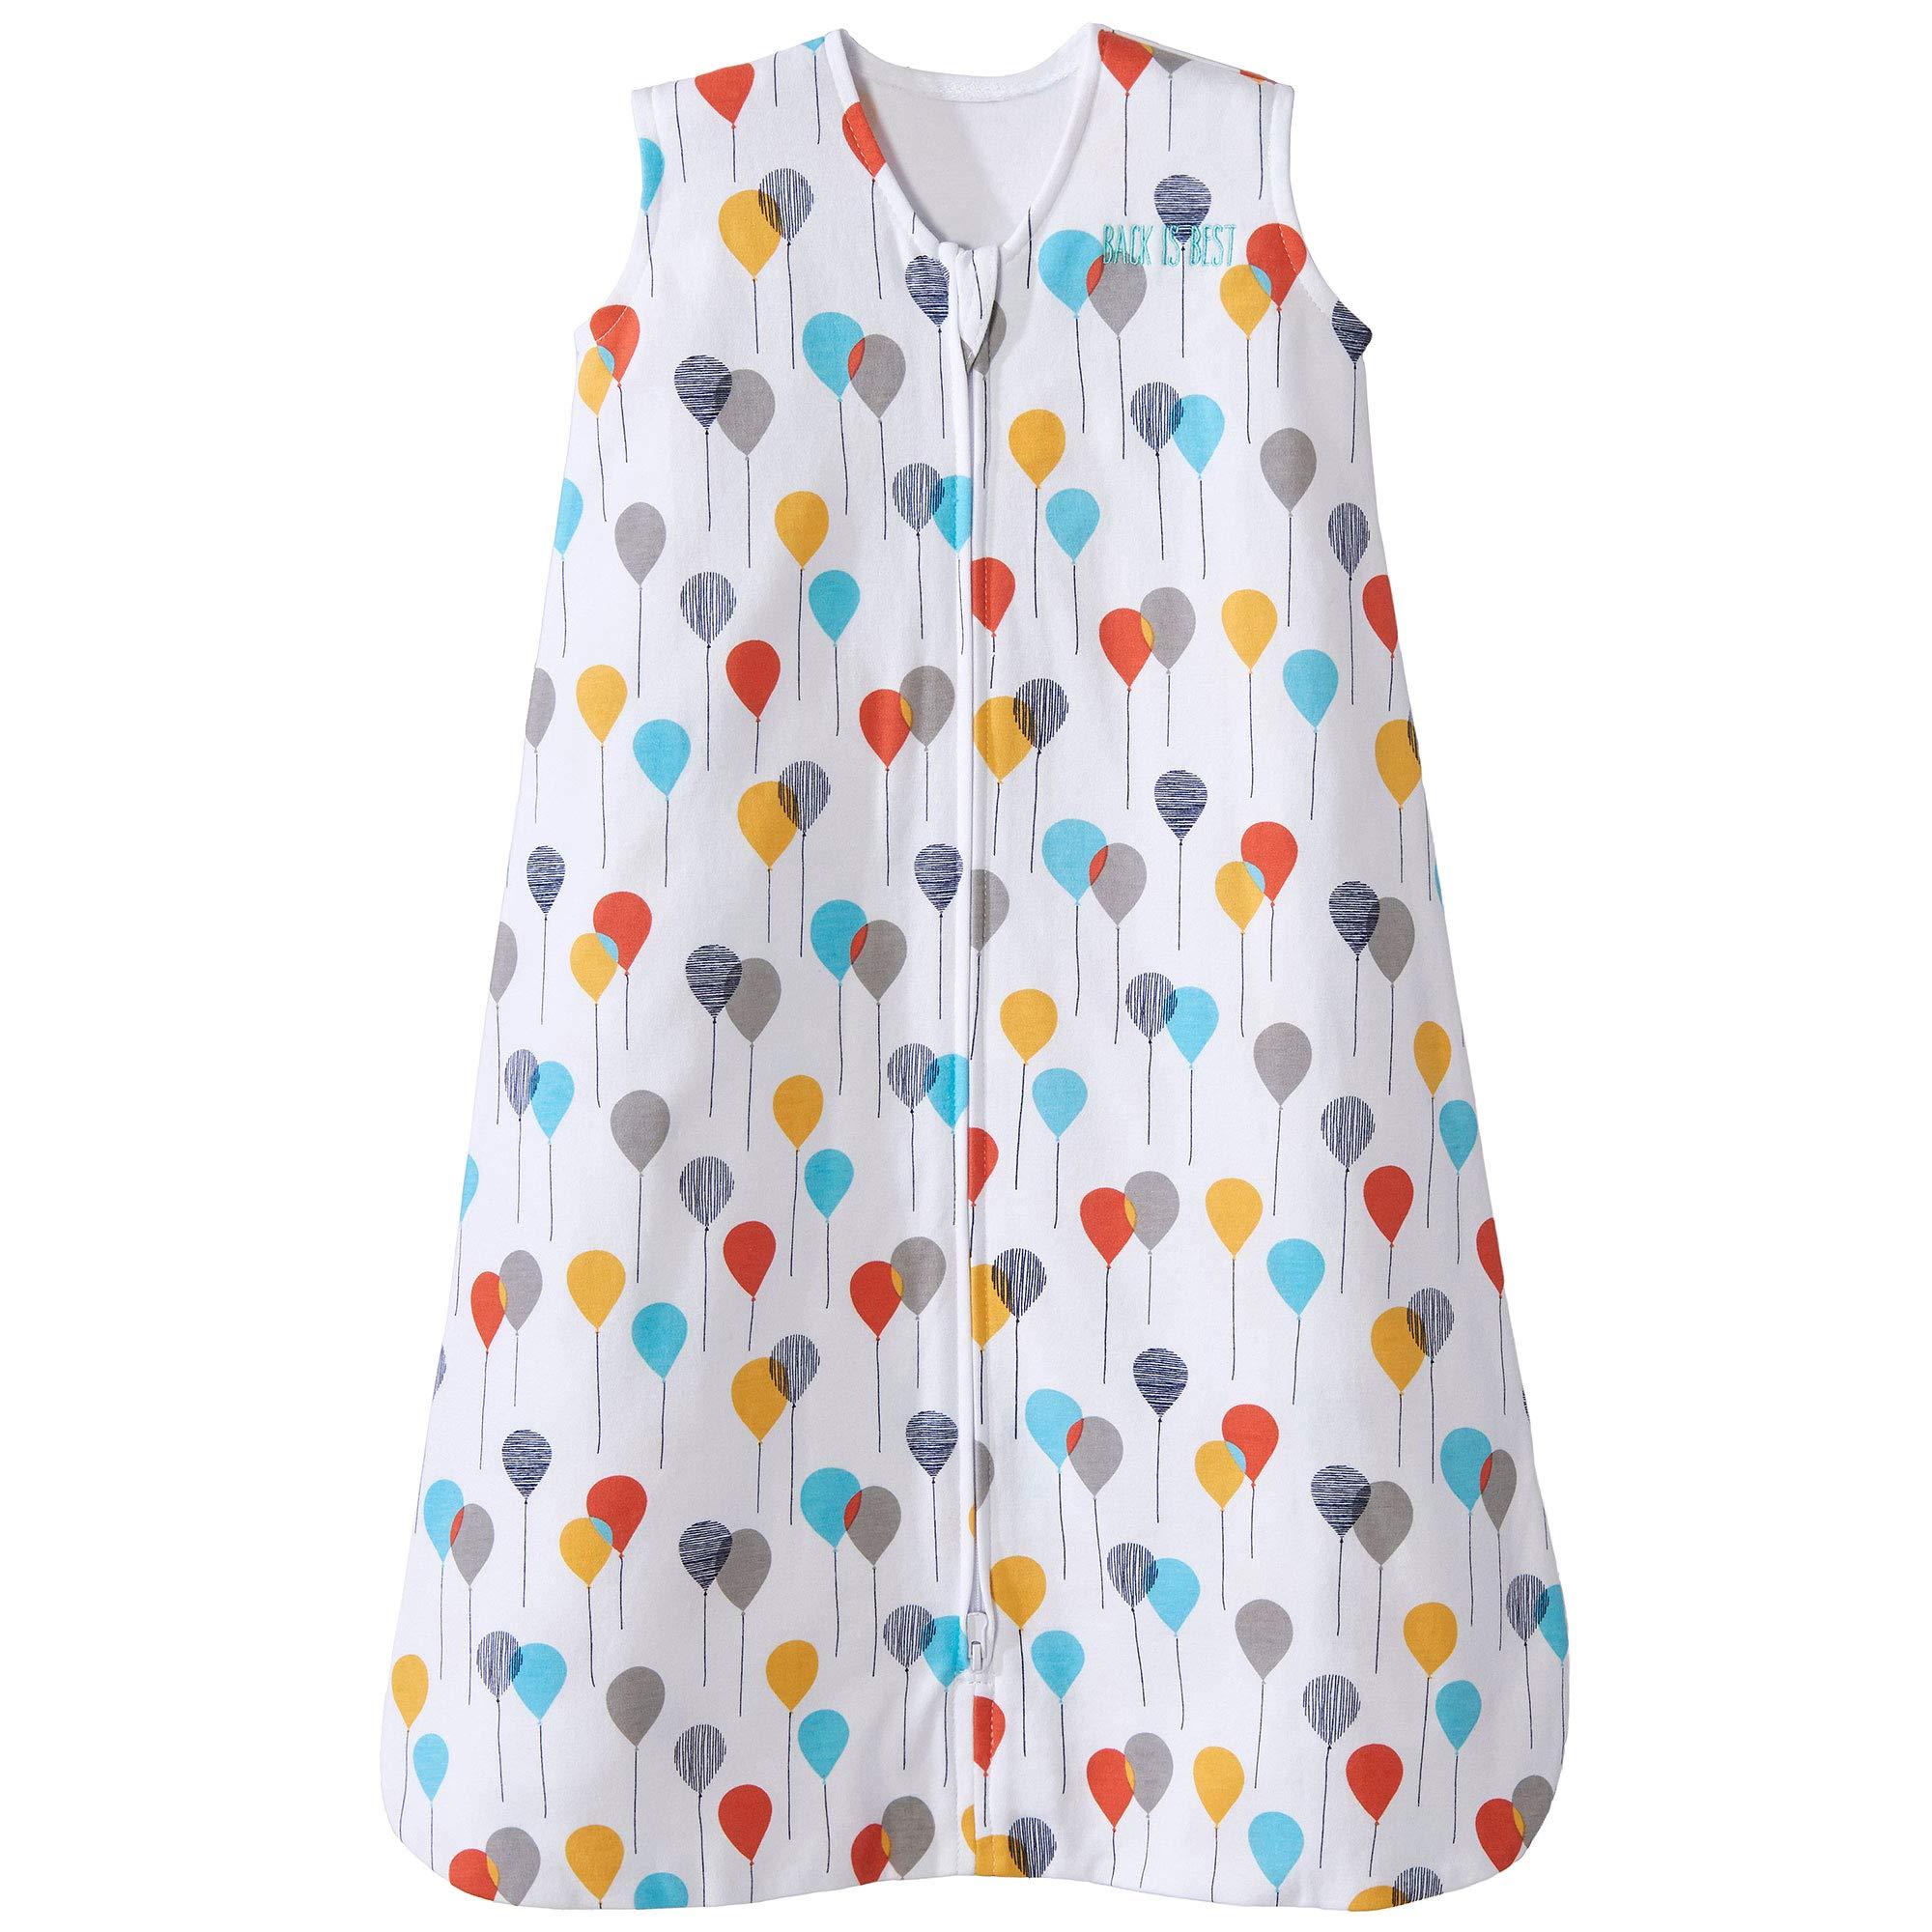 Halo Sleepsack Cotton Wearable Blanket, Neutral Balloons, X-Large